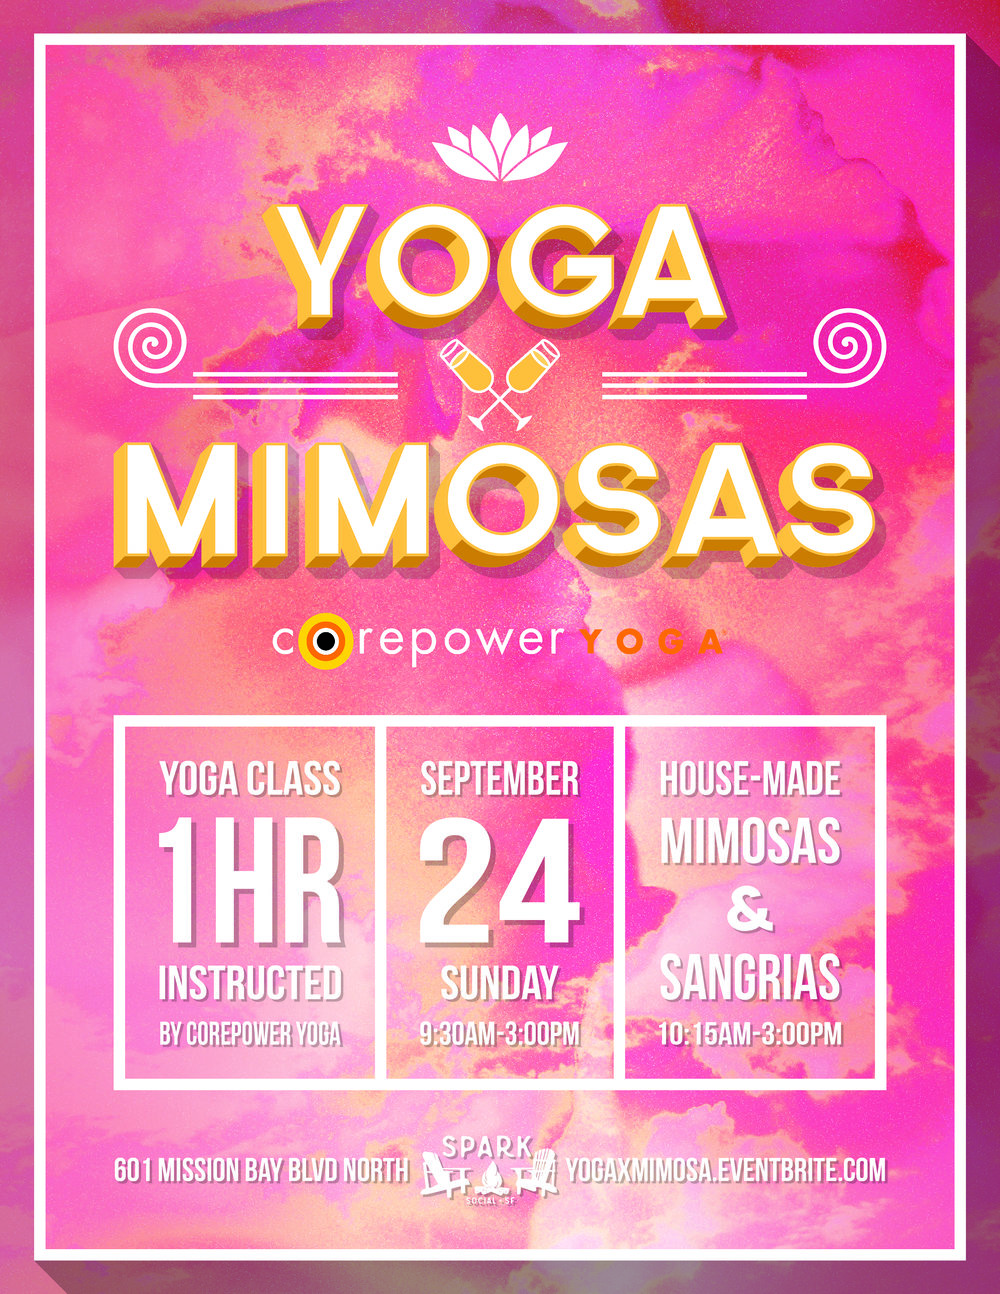 YOGA+Mimosas (8.5x11 PRINT).jpg